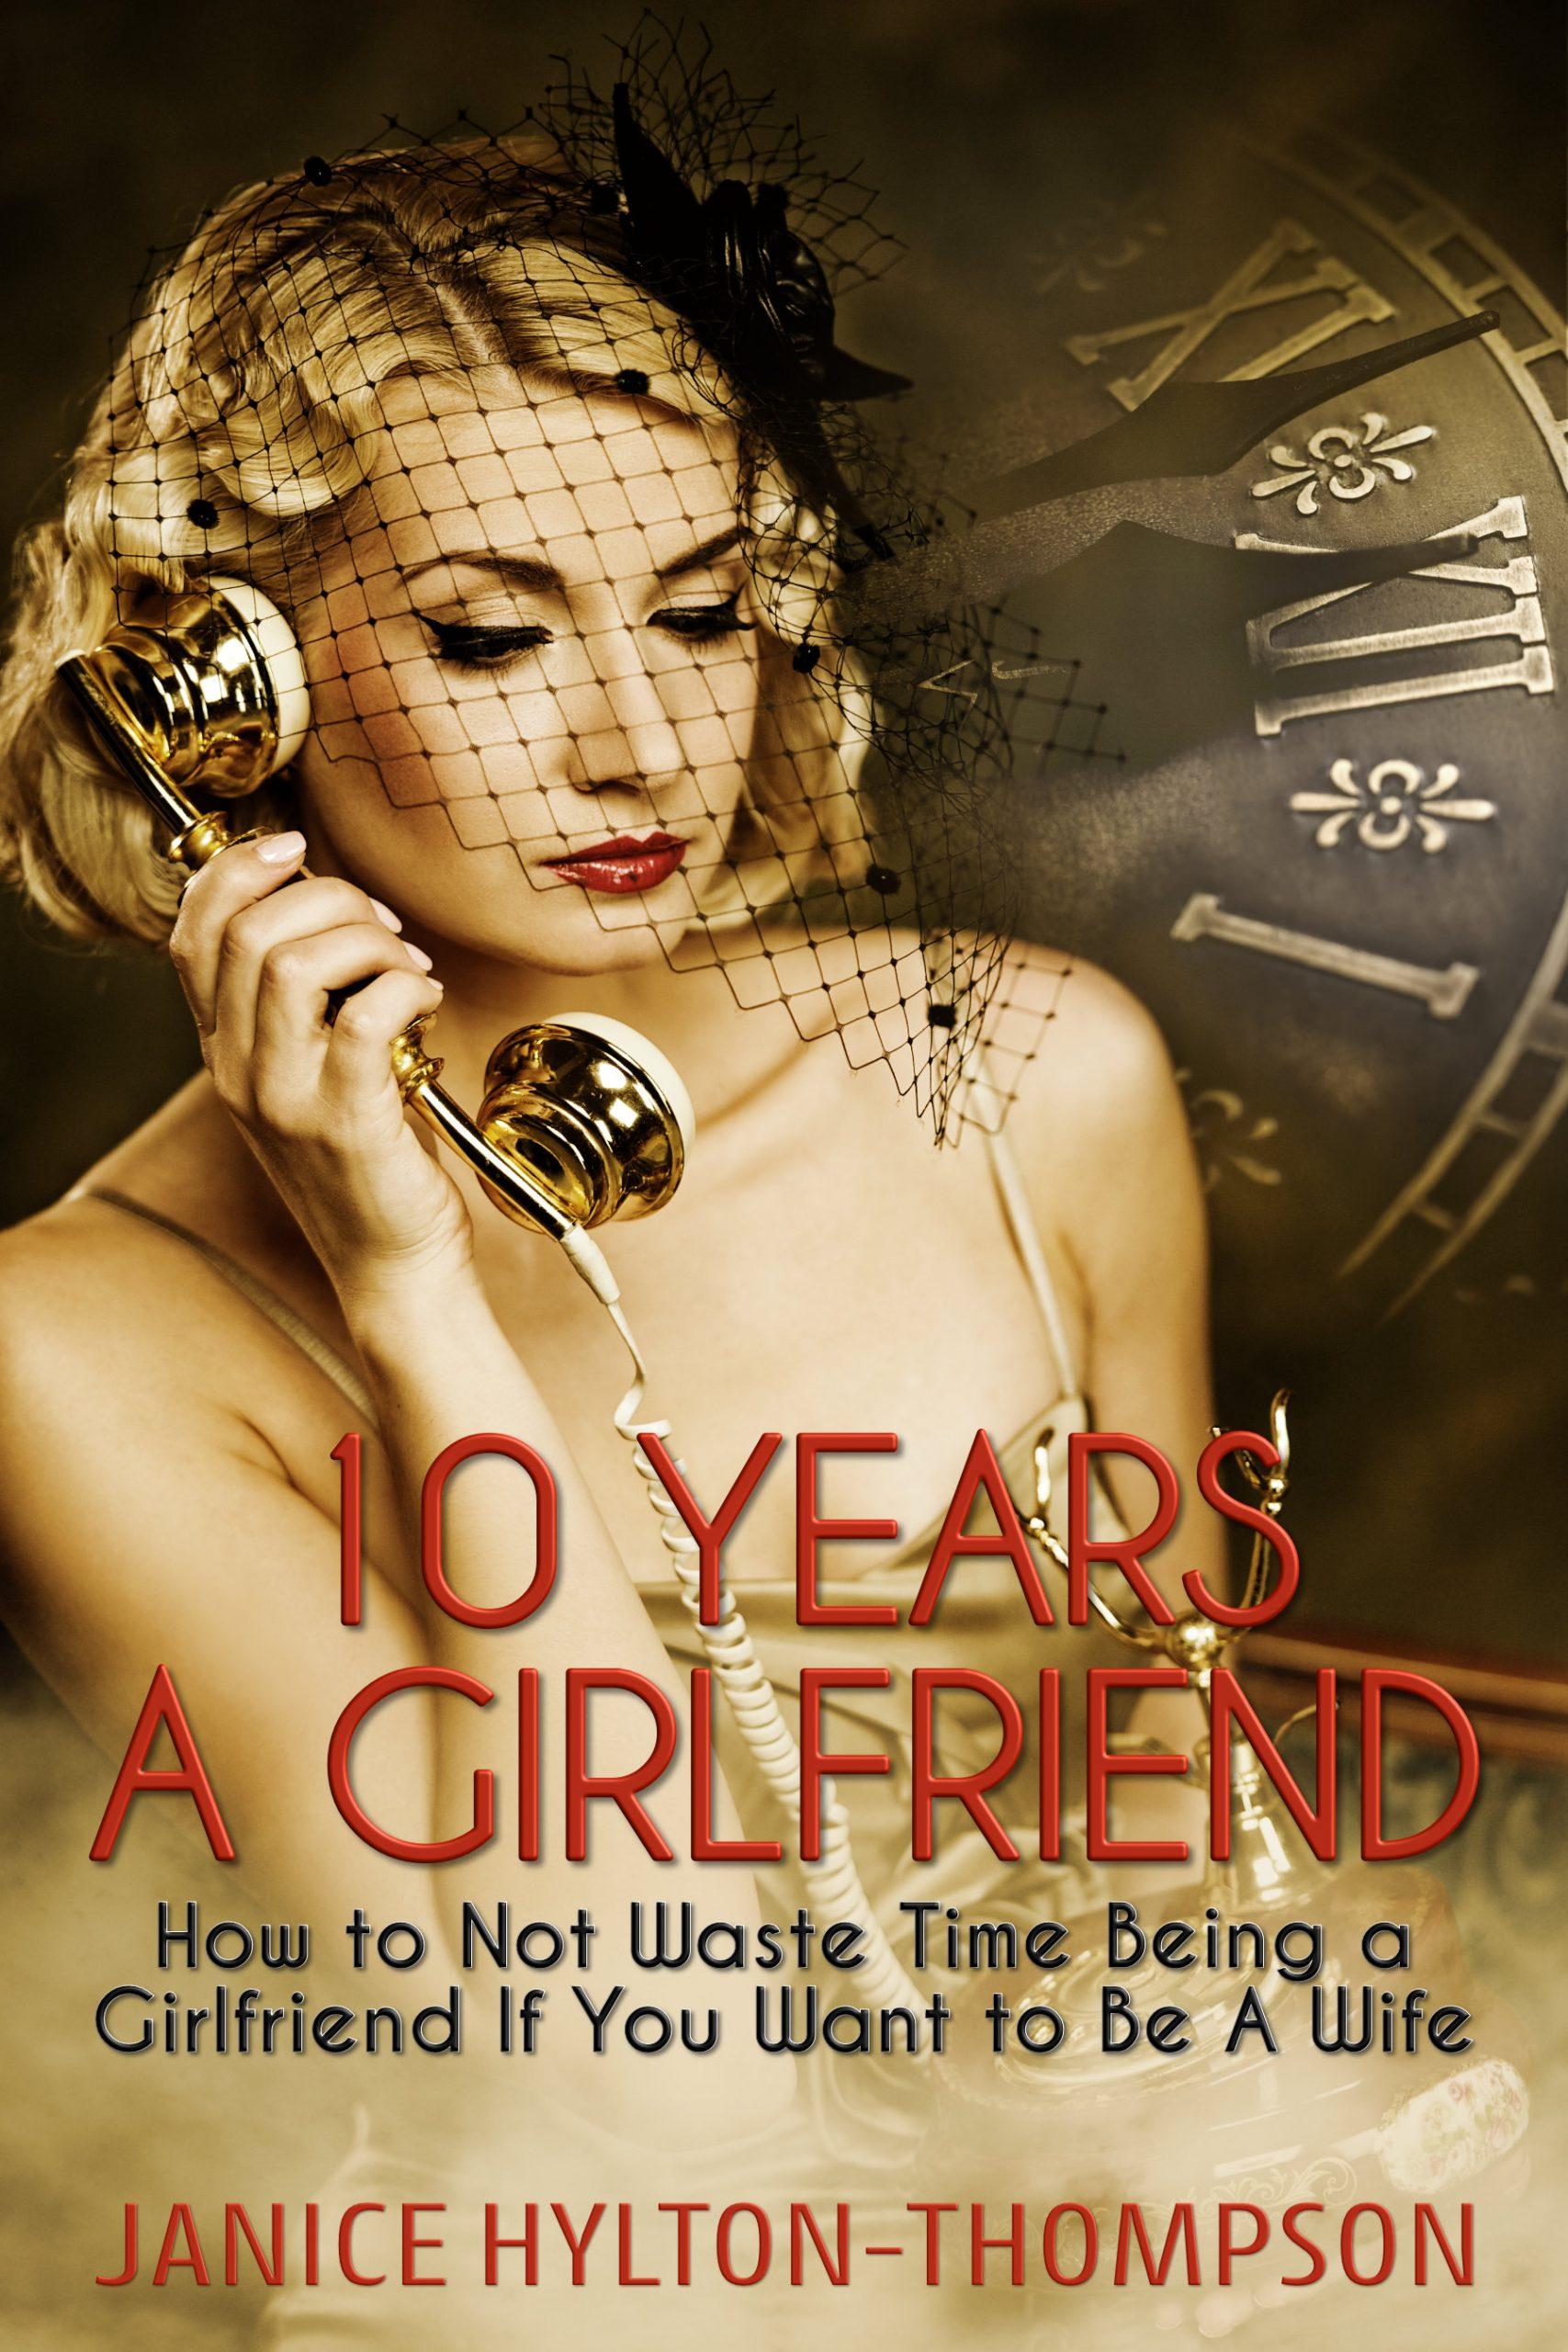 10 Years a Girlfriend